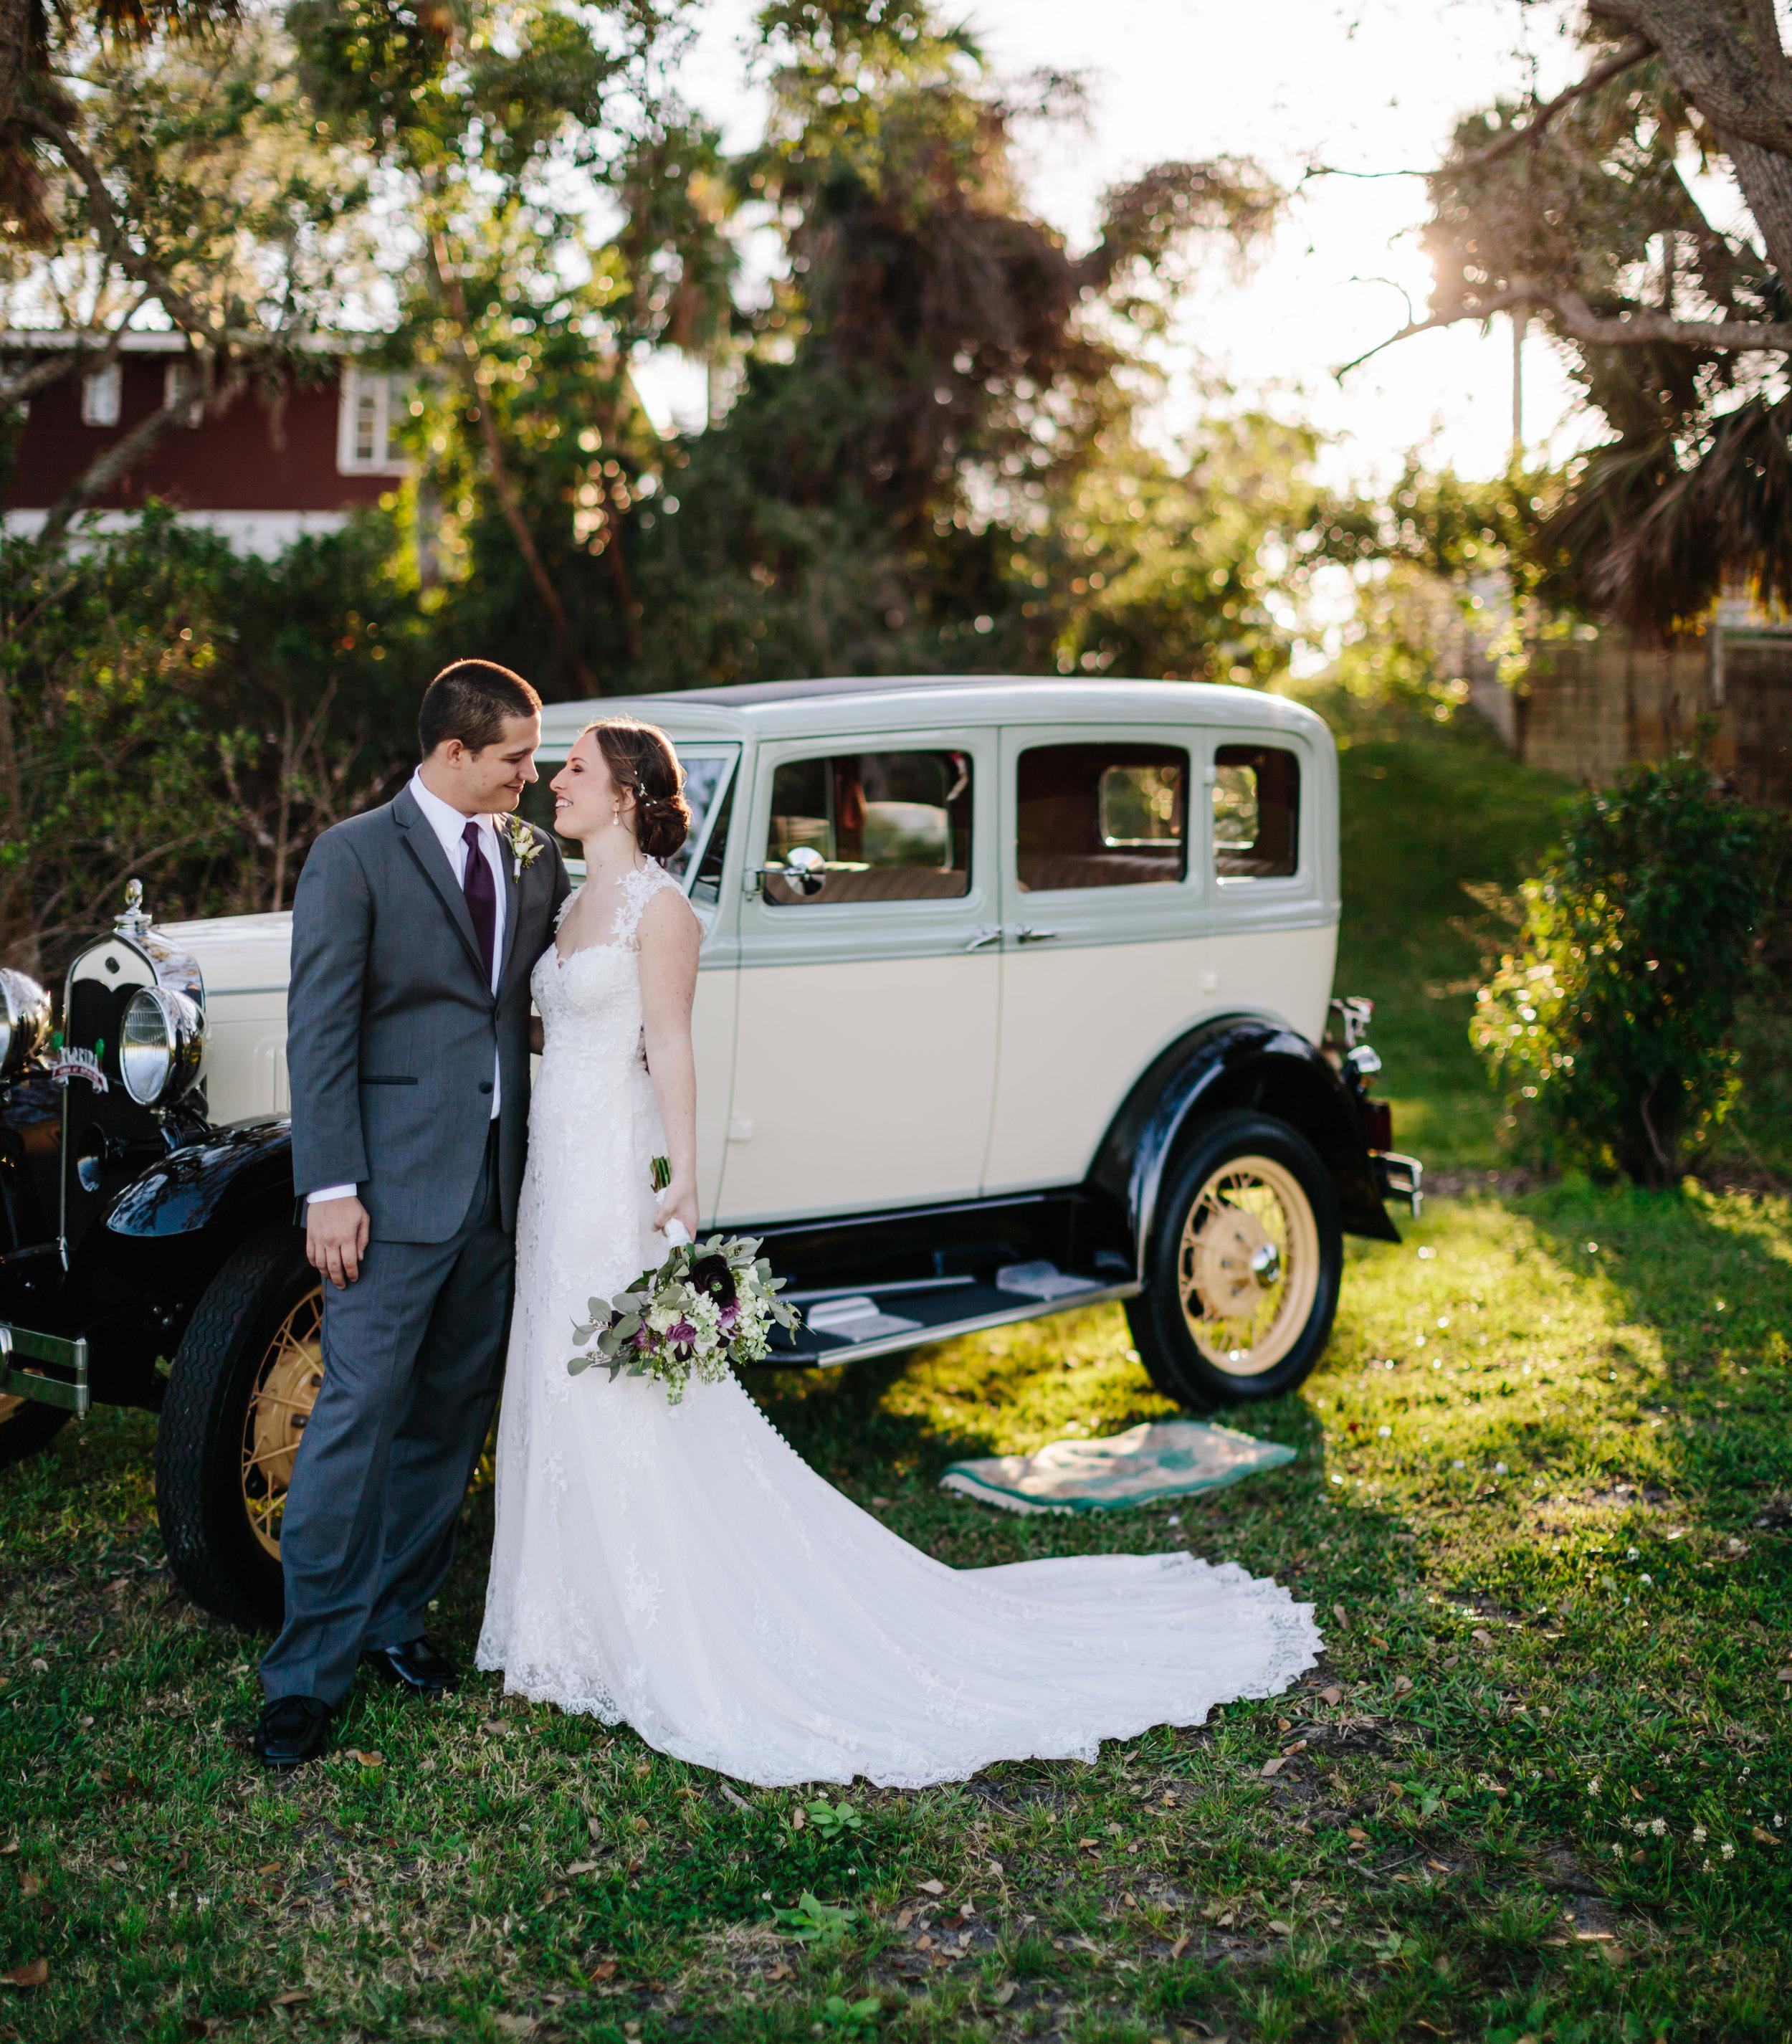 2018.02.17 Whitney and Joe Meyer Melbourne Wedding (378 of 759).jpg